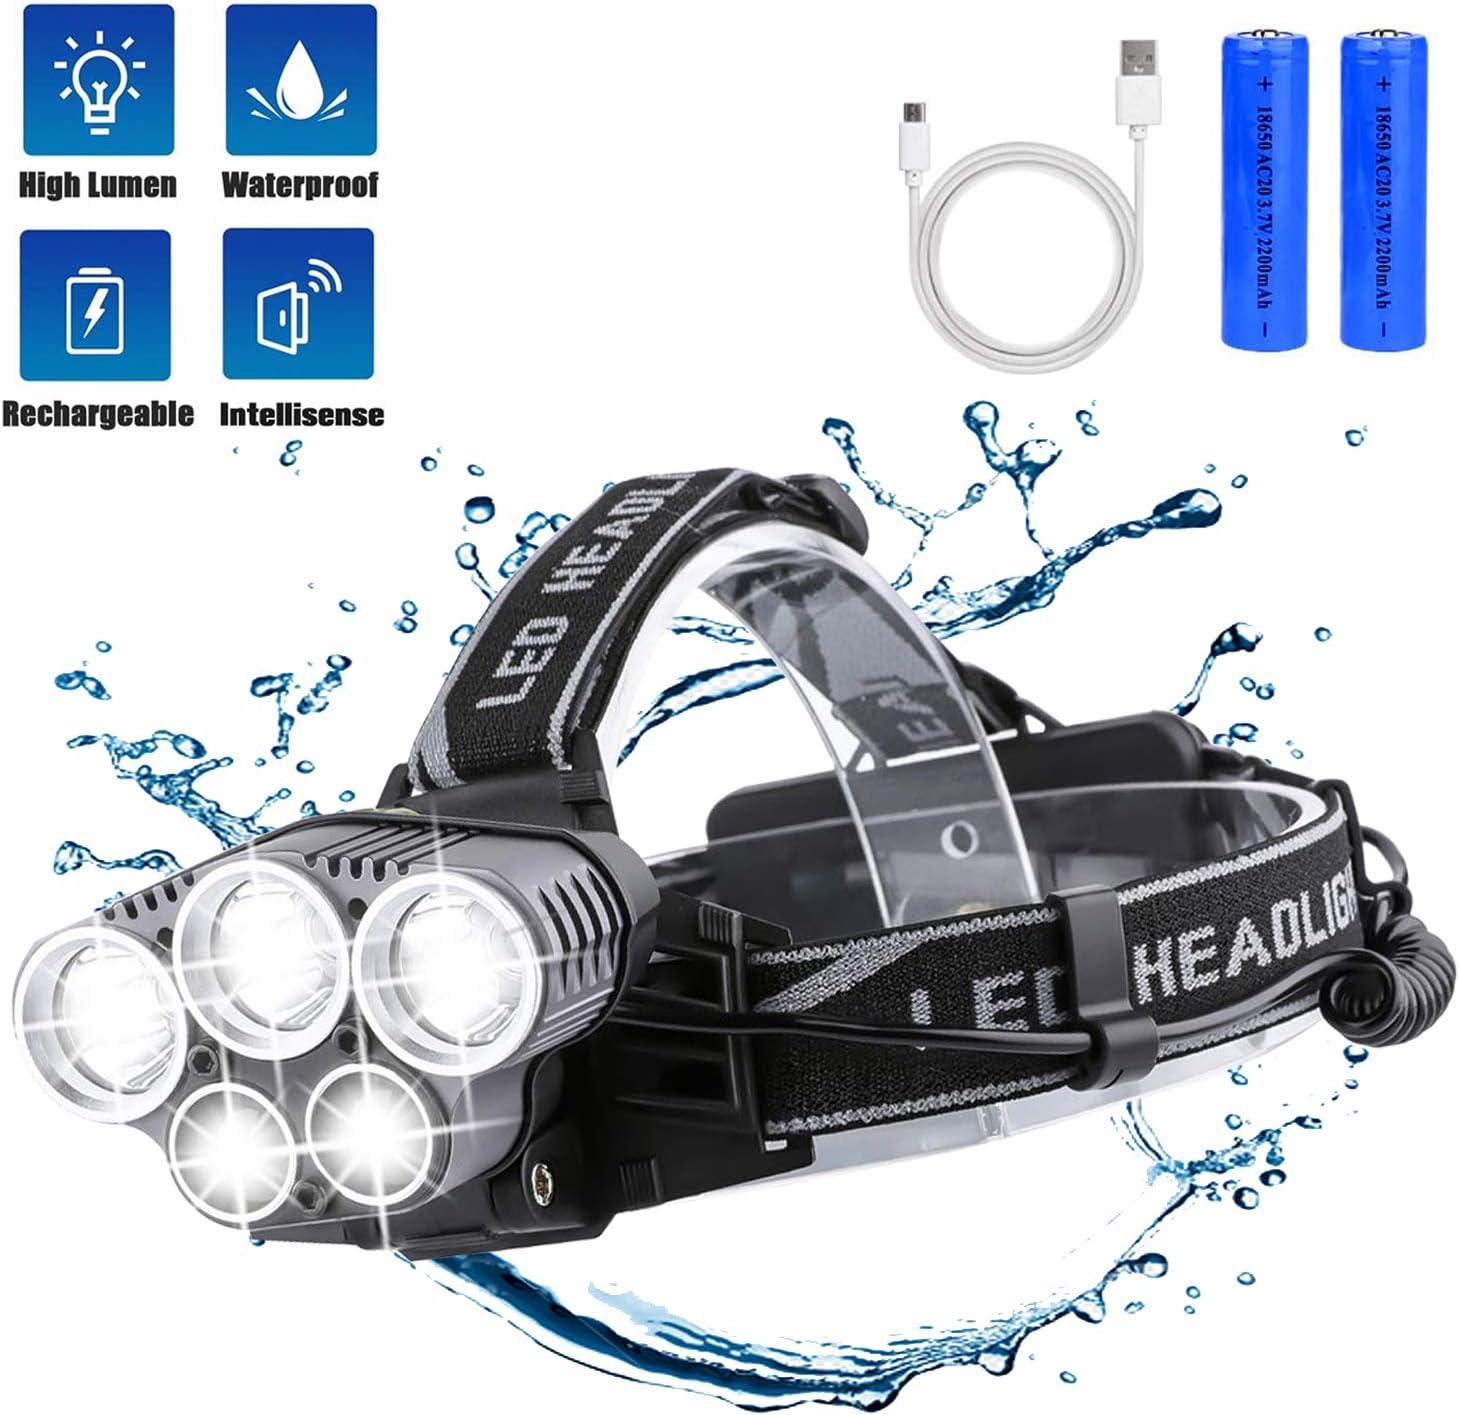 BETECK Lámpara de Cabeza LED USB Recargable Alta Potencia 15000LM, Linterna Frontal 5 LED 6 Modos IPX4 Impermeable para Camping, Pesca, Ciclismo, Carrera, Caza